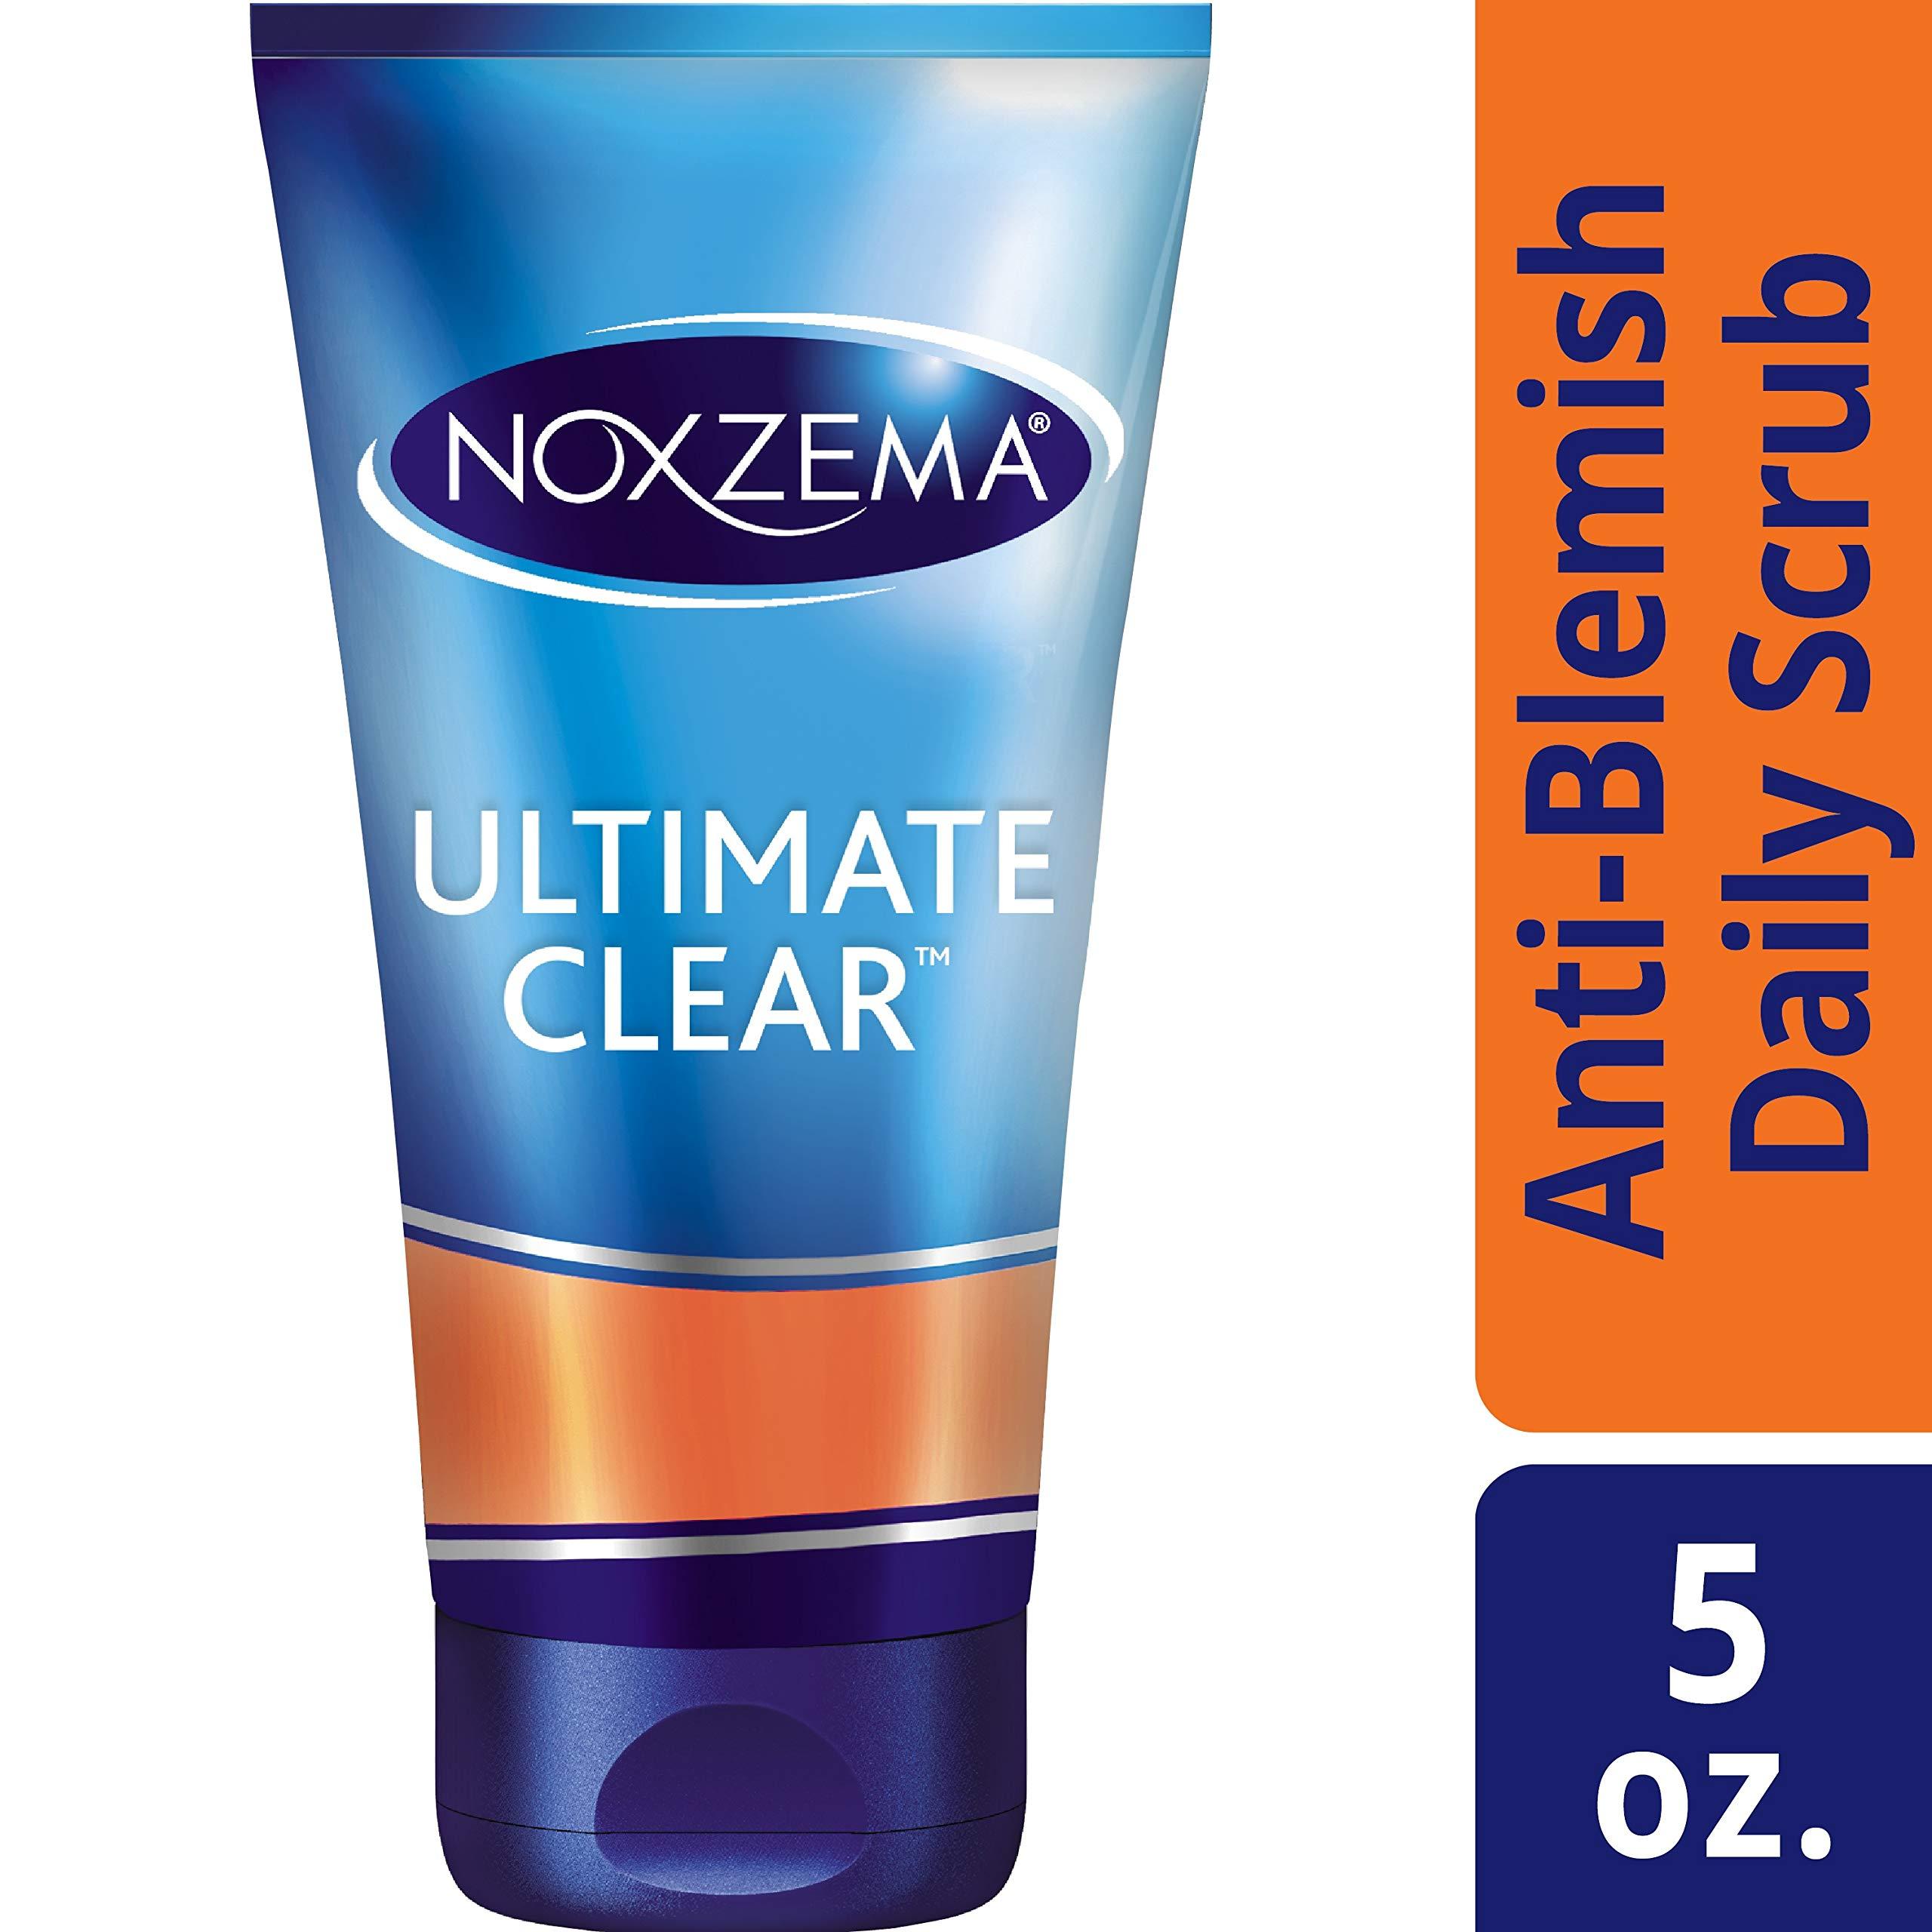 Noxzema Ultimate Clear Anti-Blemish Daily Deep Pore Face Scrub 5 oz, 6 Count